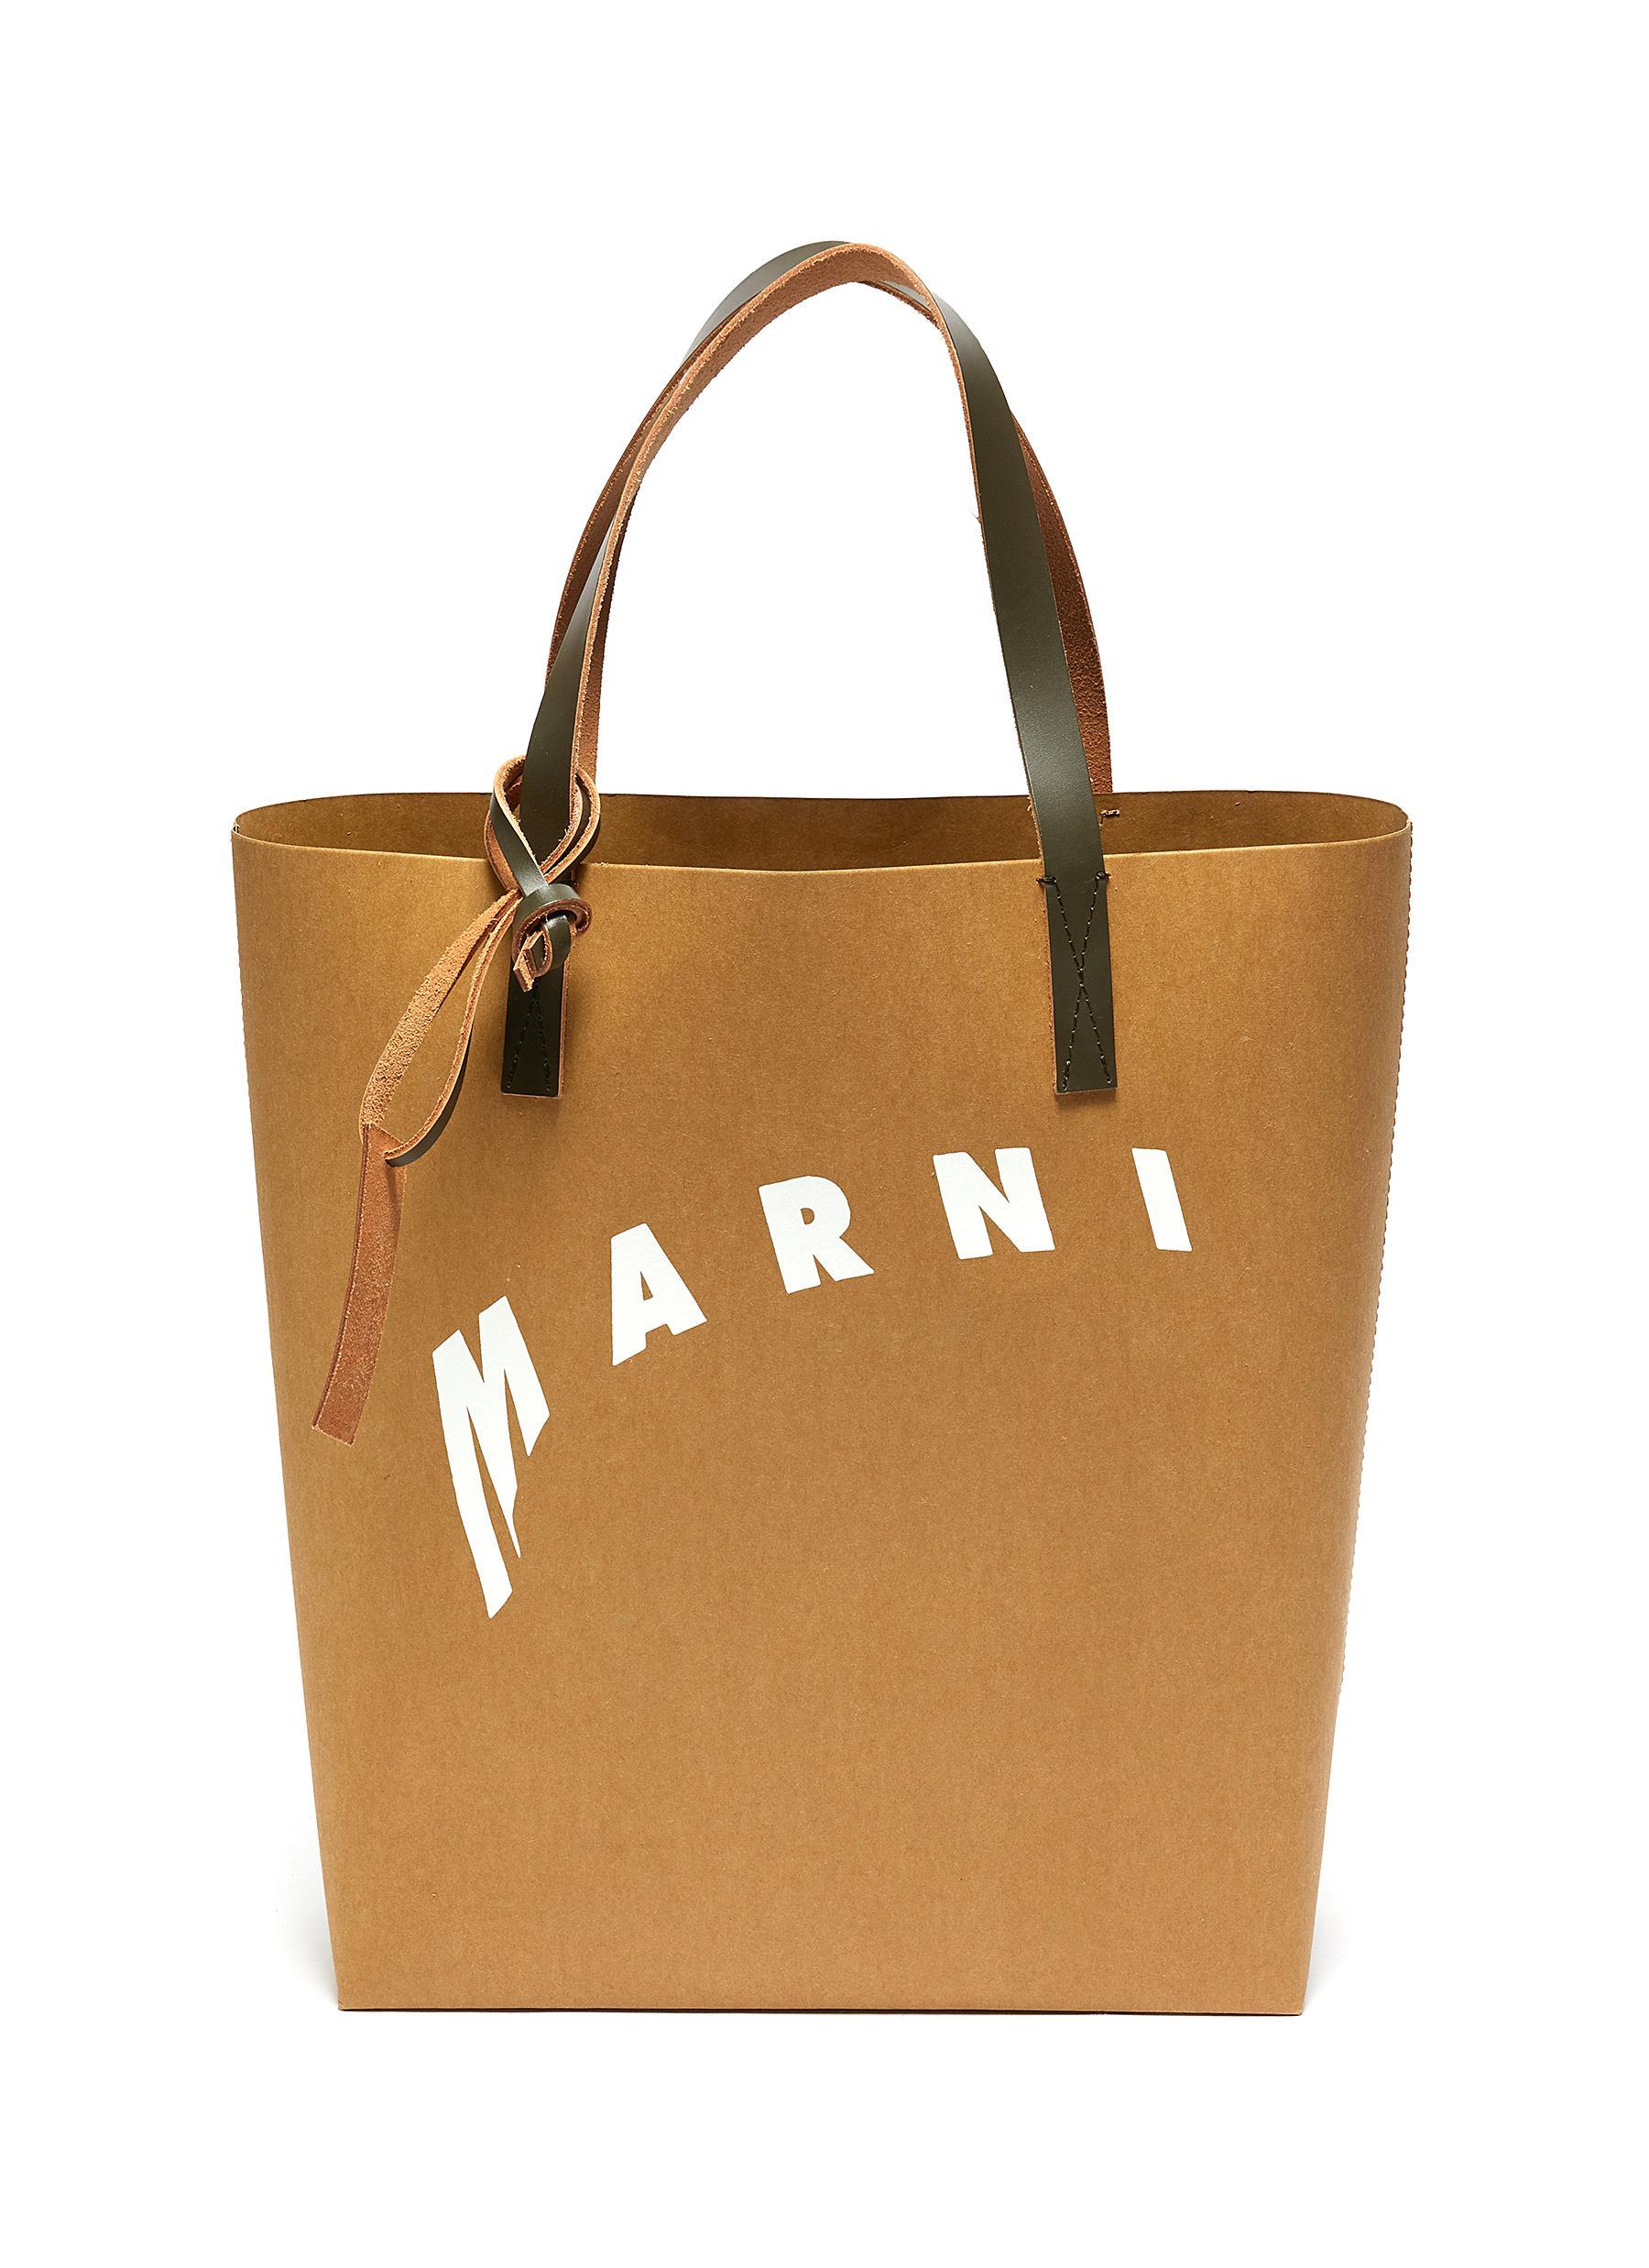 MARNI LOGO PRINT CELLULOSE SHOPPING BAG TOTE